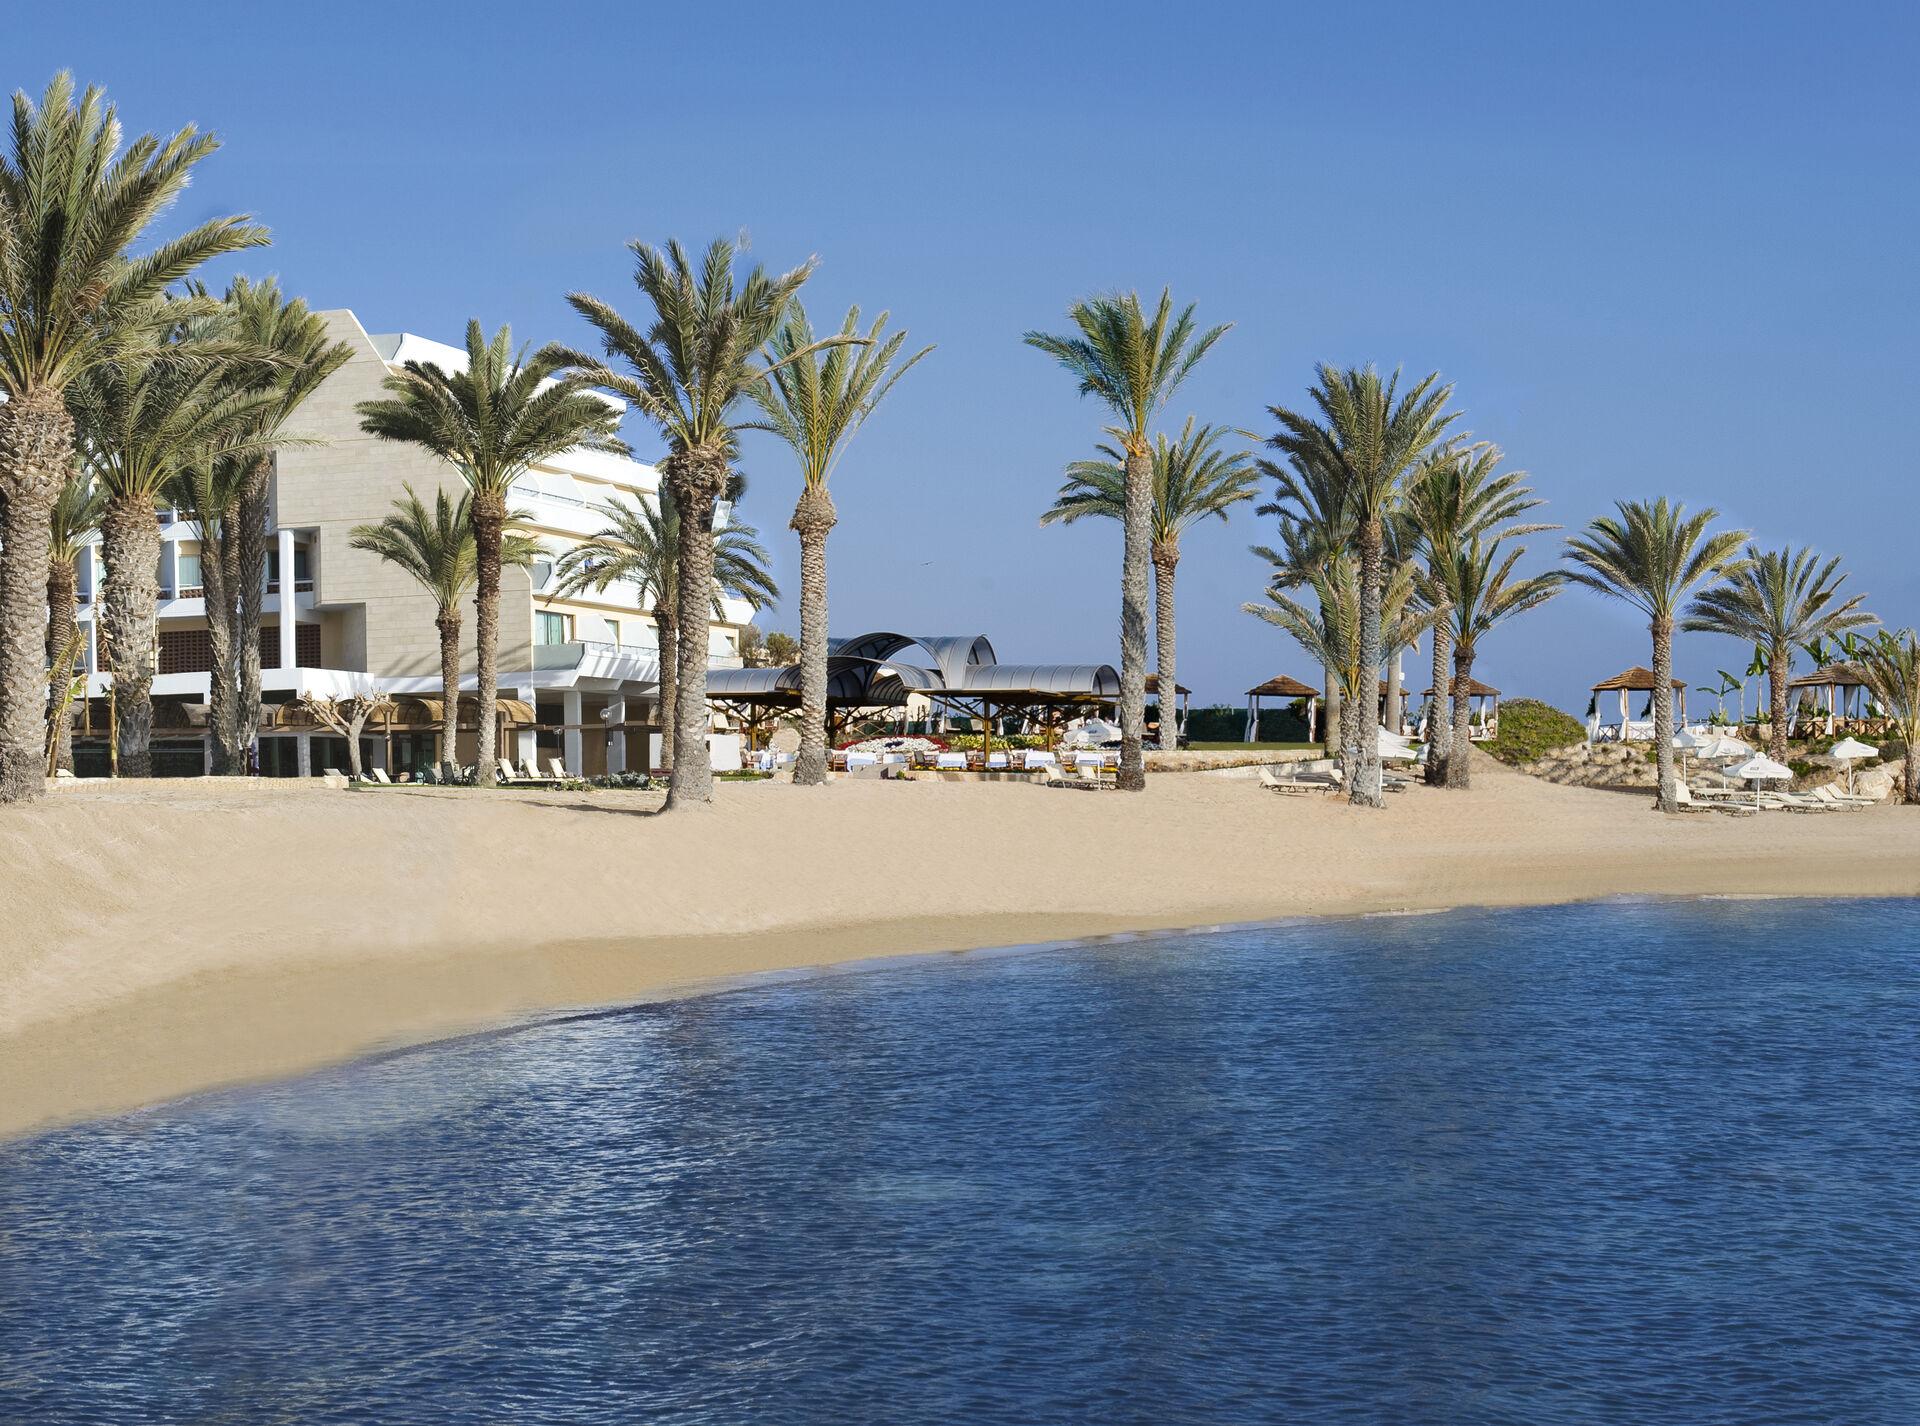 https://cms.satur.sk/data/imgs/tour_image/orig/02-1-pioneer-beach-hotel-beach-with-no-couple-1972648.jpg